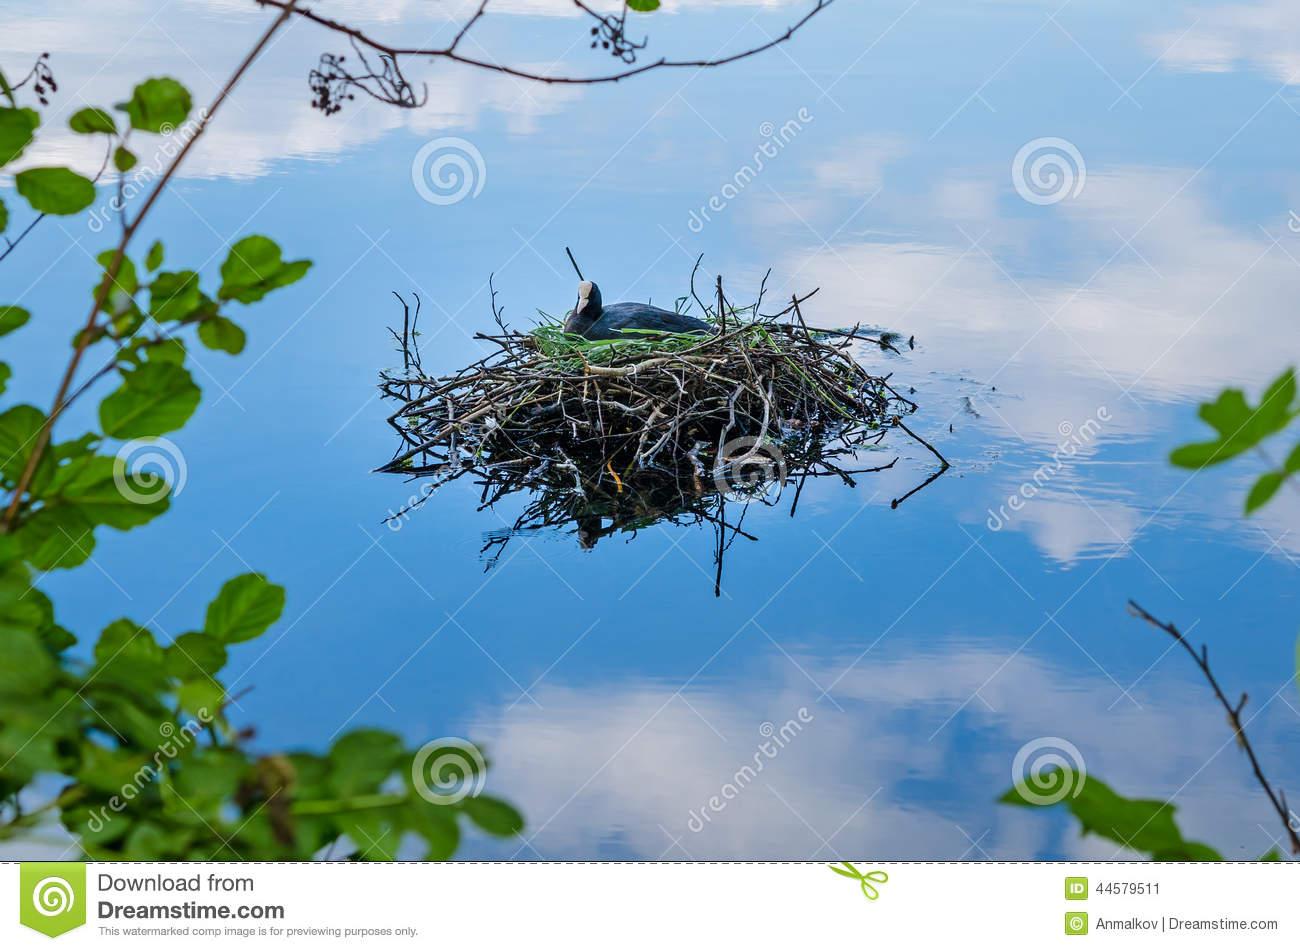 Common Coot Bird Nest On Water Fulica Atra Stock Photo.